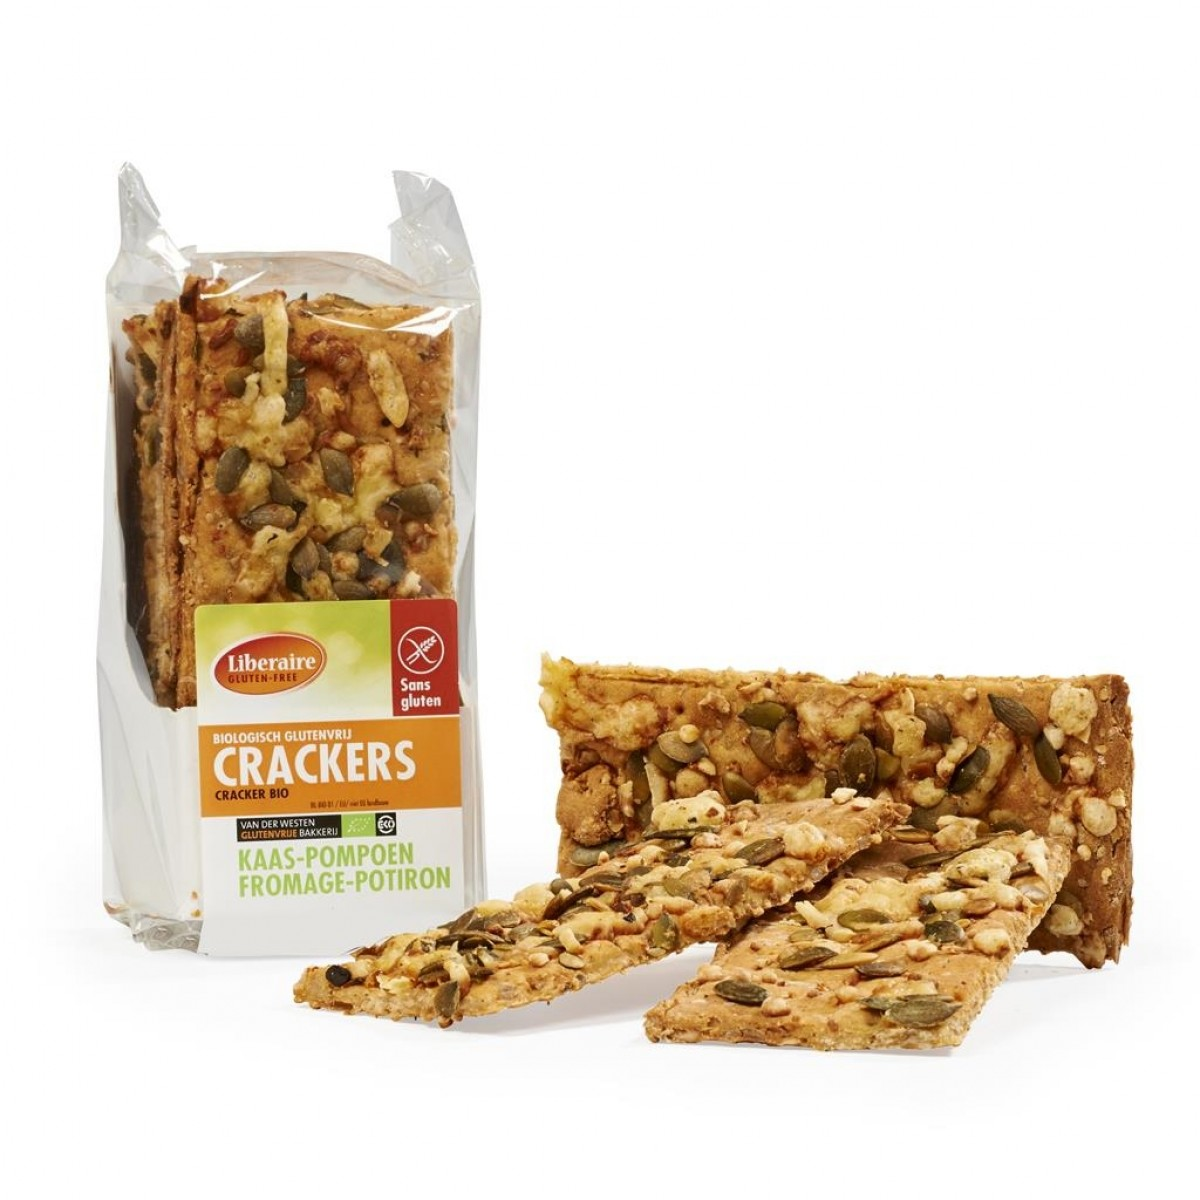 Crackers Kaas-Pompoen